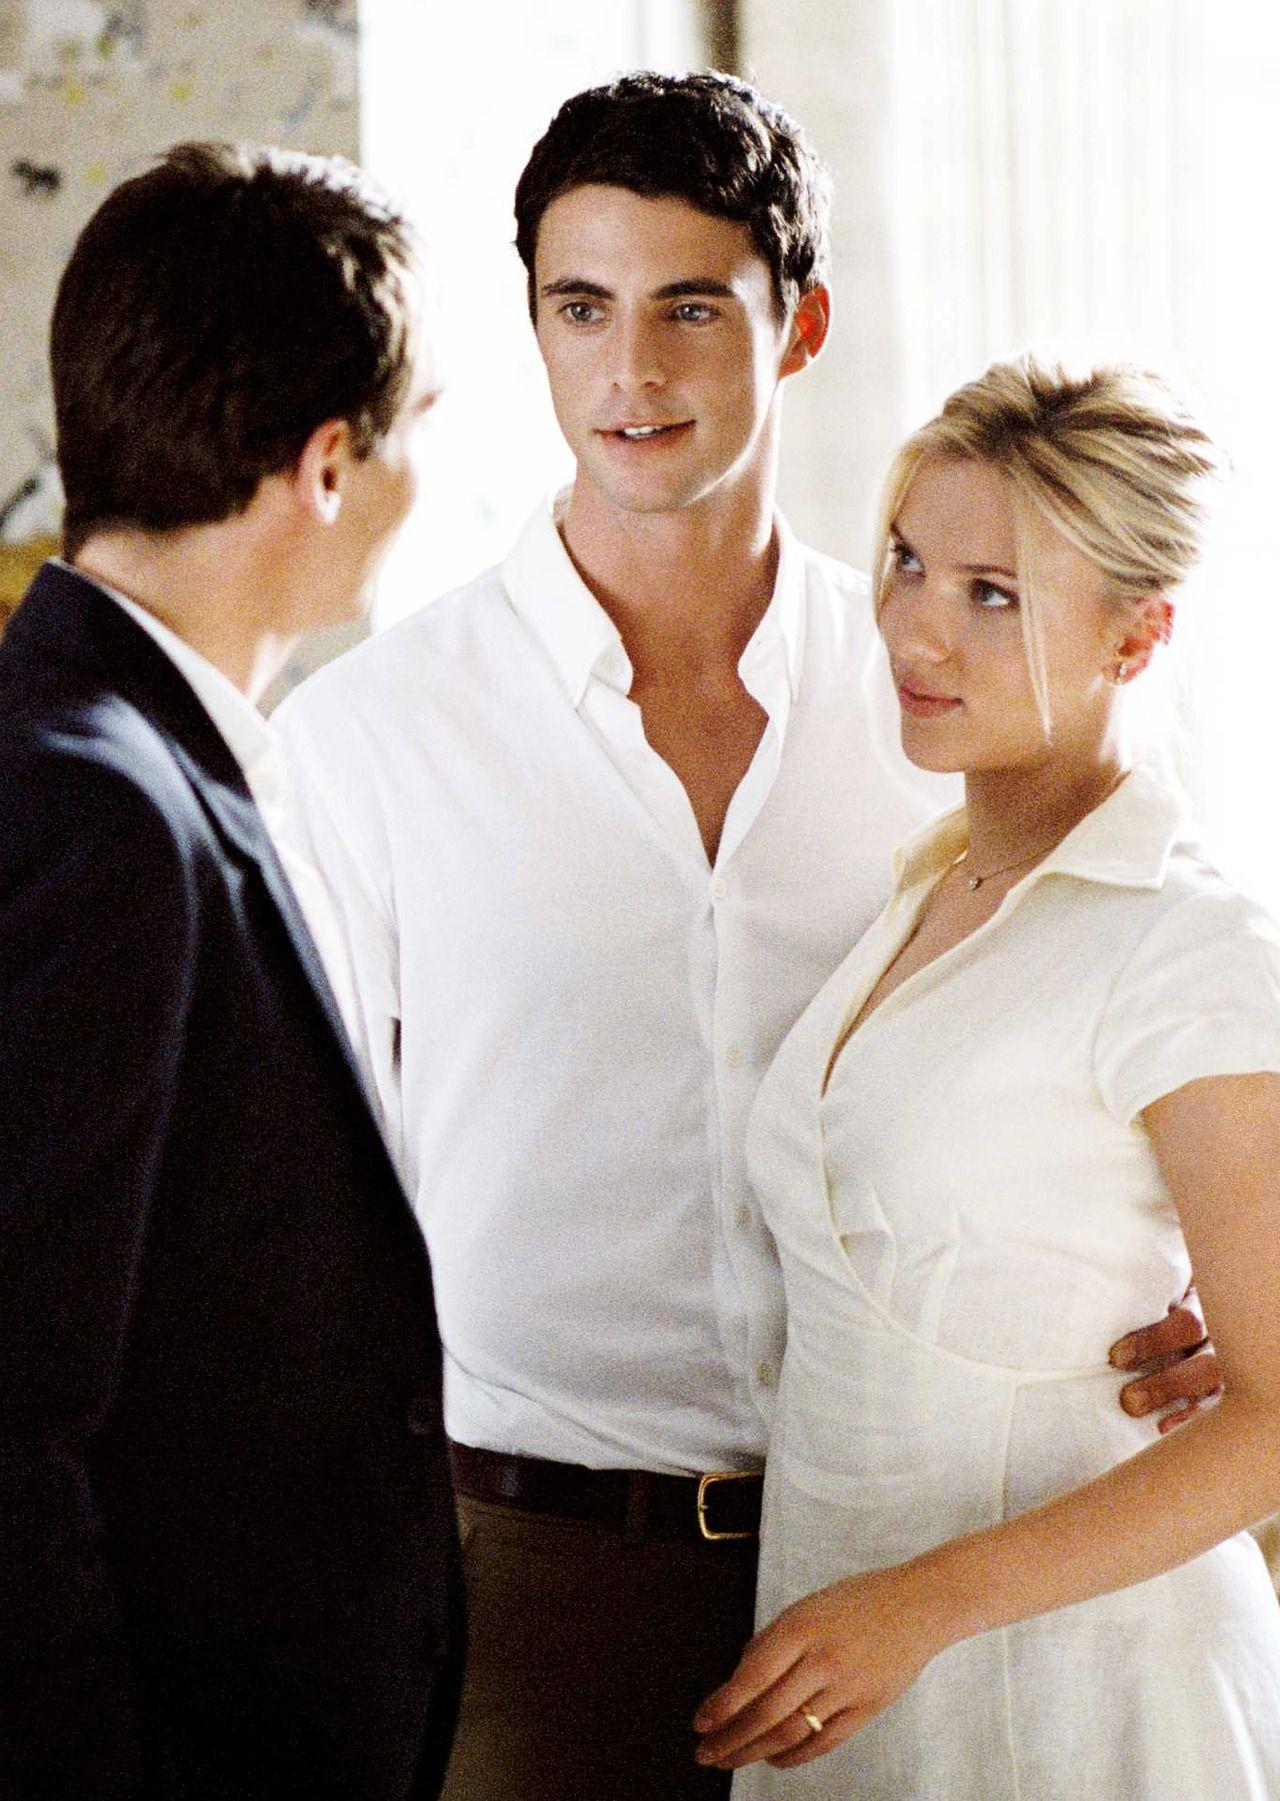 Jonathan Rhys Meyers Matthew Goode And Scarlett Johansson In Match Point 2005 Match Point Movie Scarlett Johansson Match Point